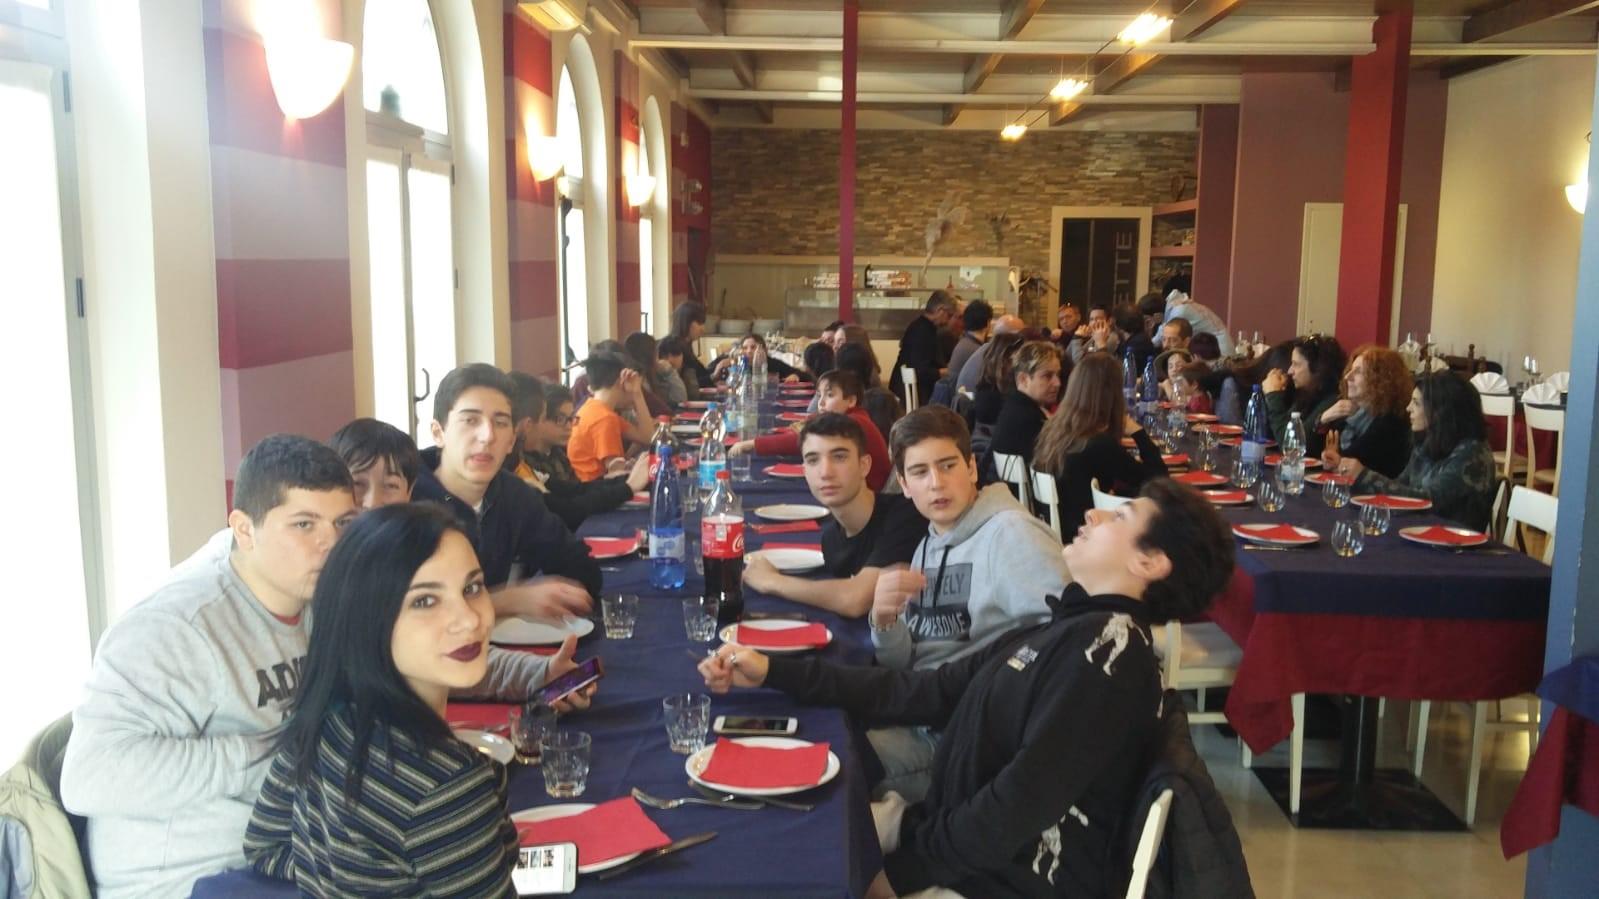 festa esami ragazzi (3)